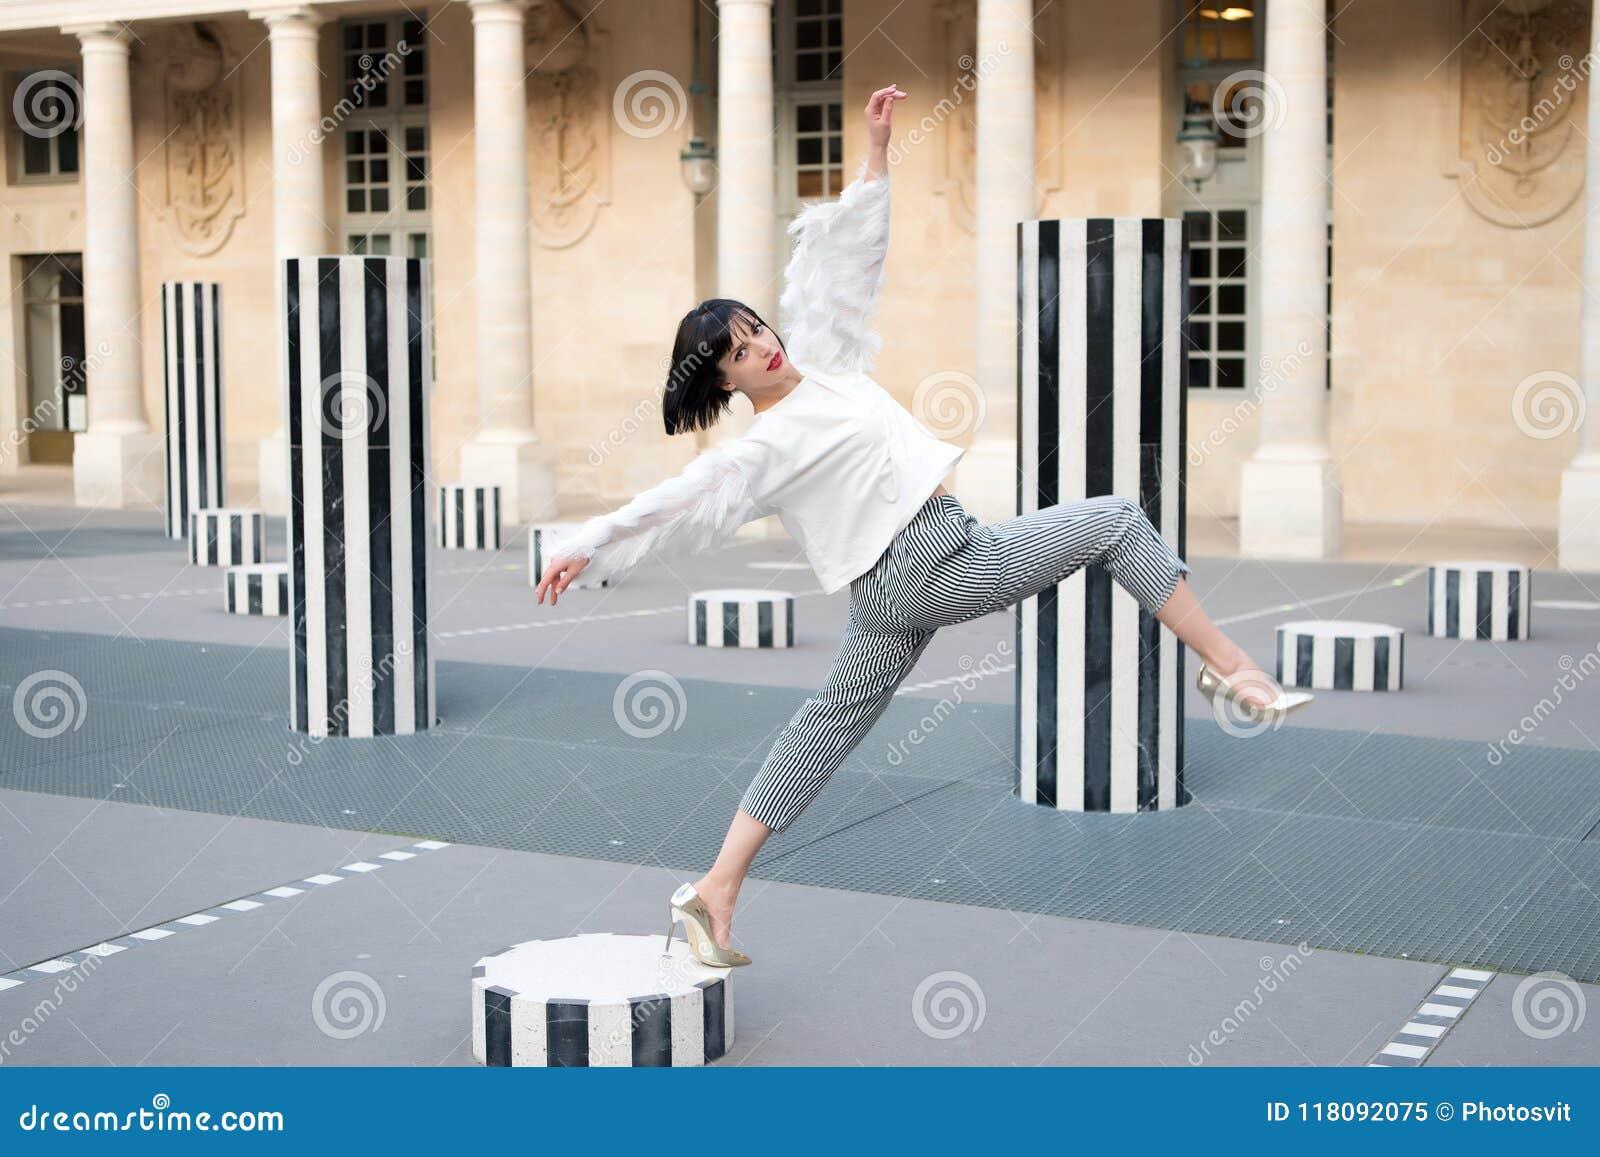 e4d7fac2ba Όμορφο κορίτσι στο ύφος μόδας στο Παρίσι